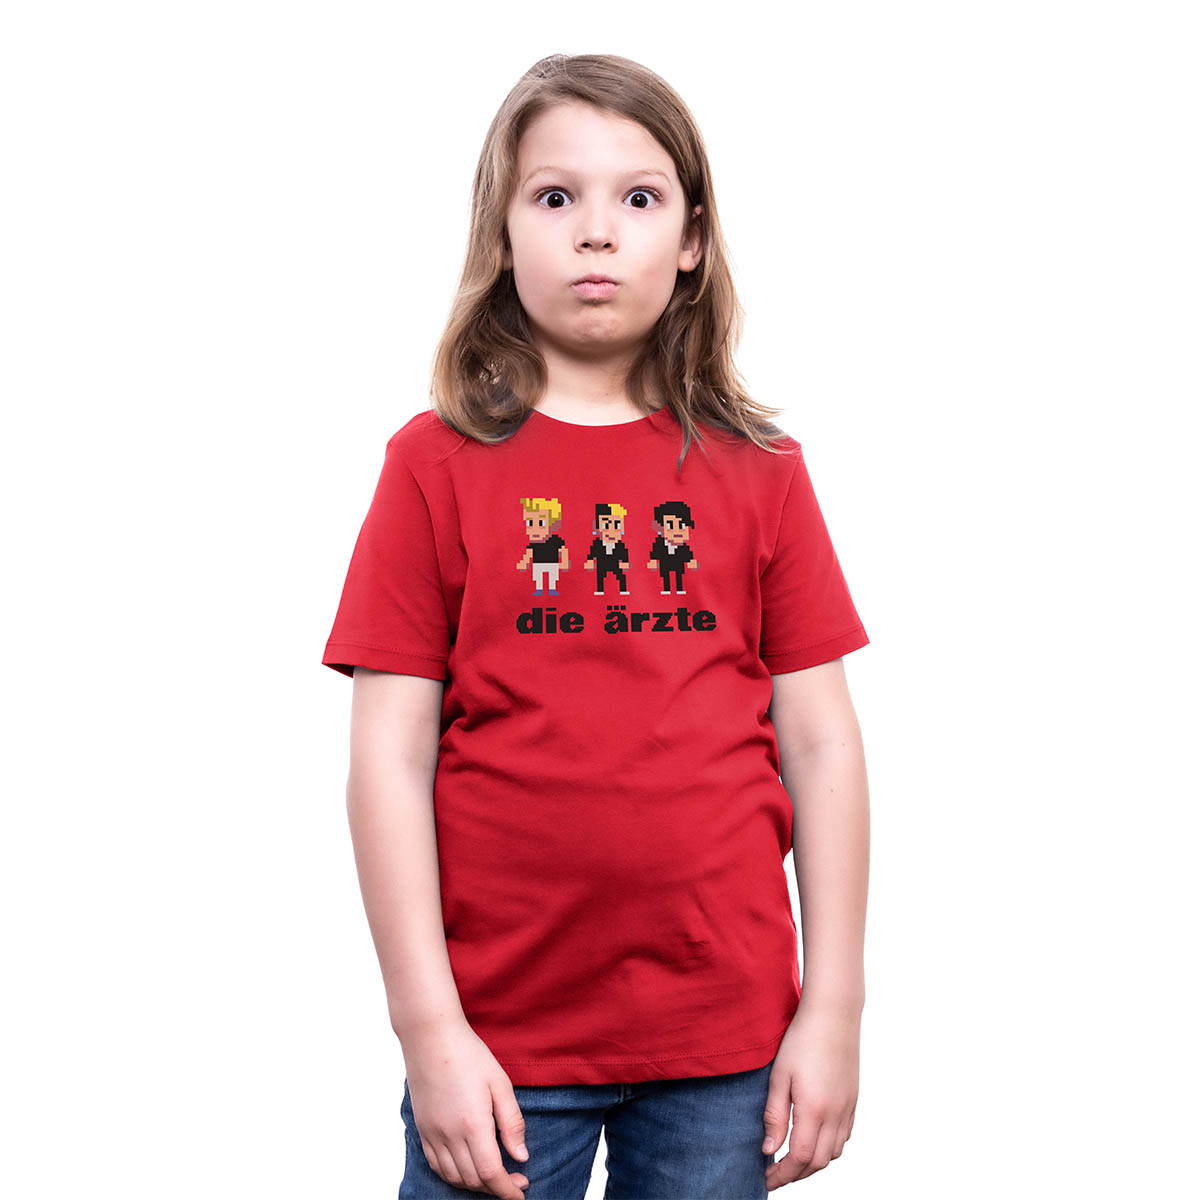 Pixel Rot   Kinder Shirt